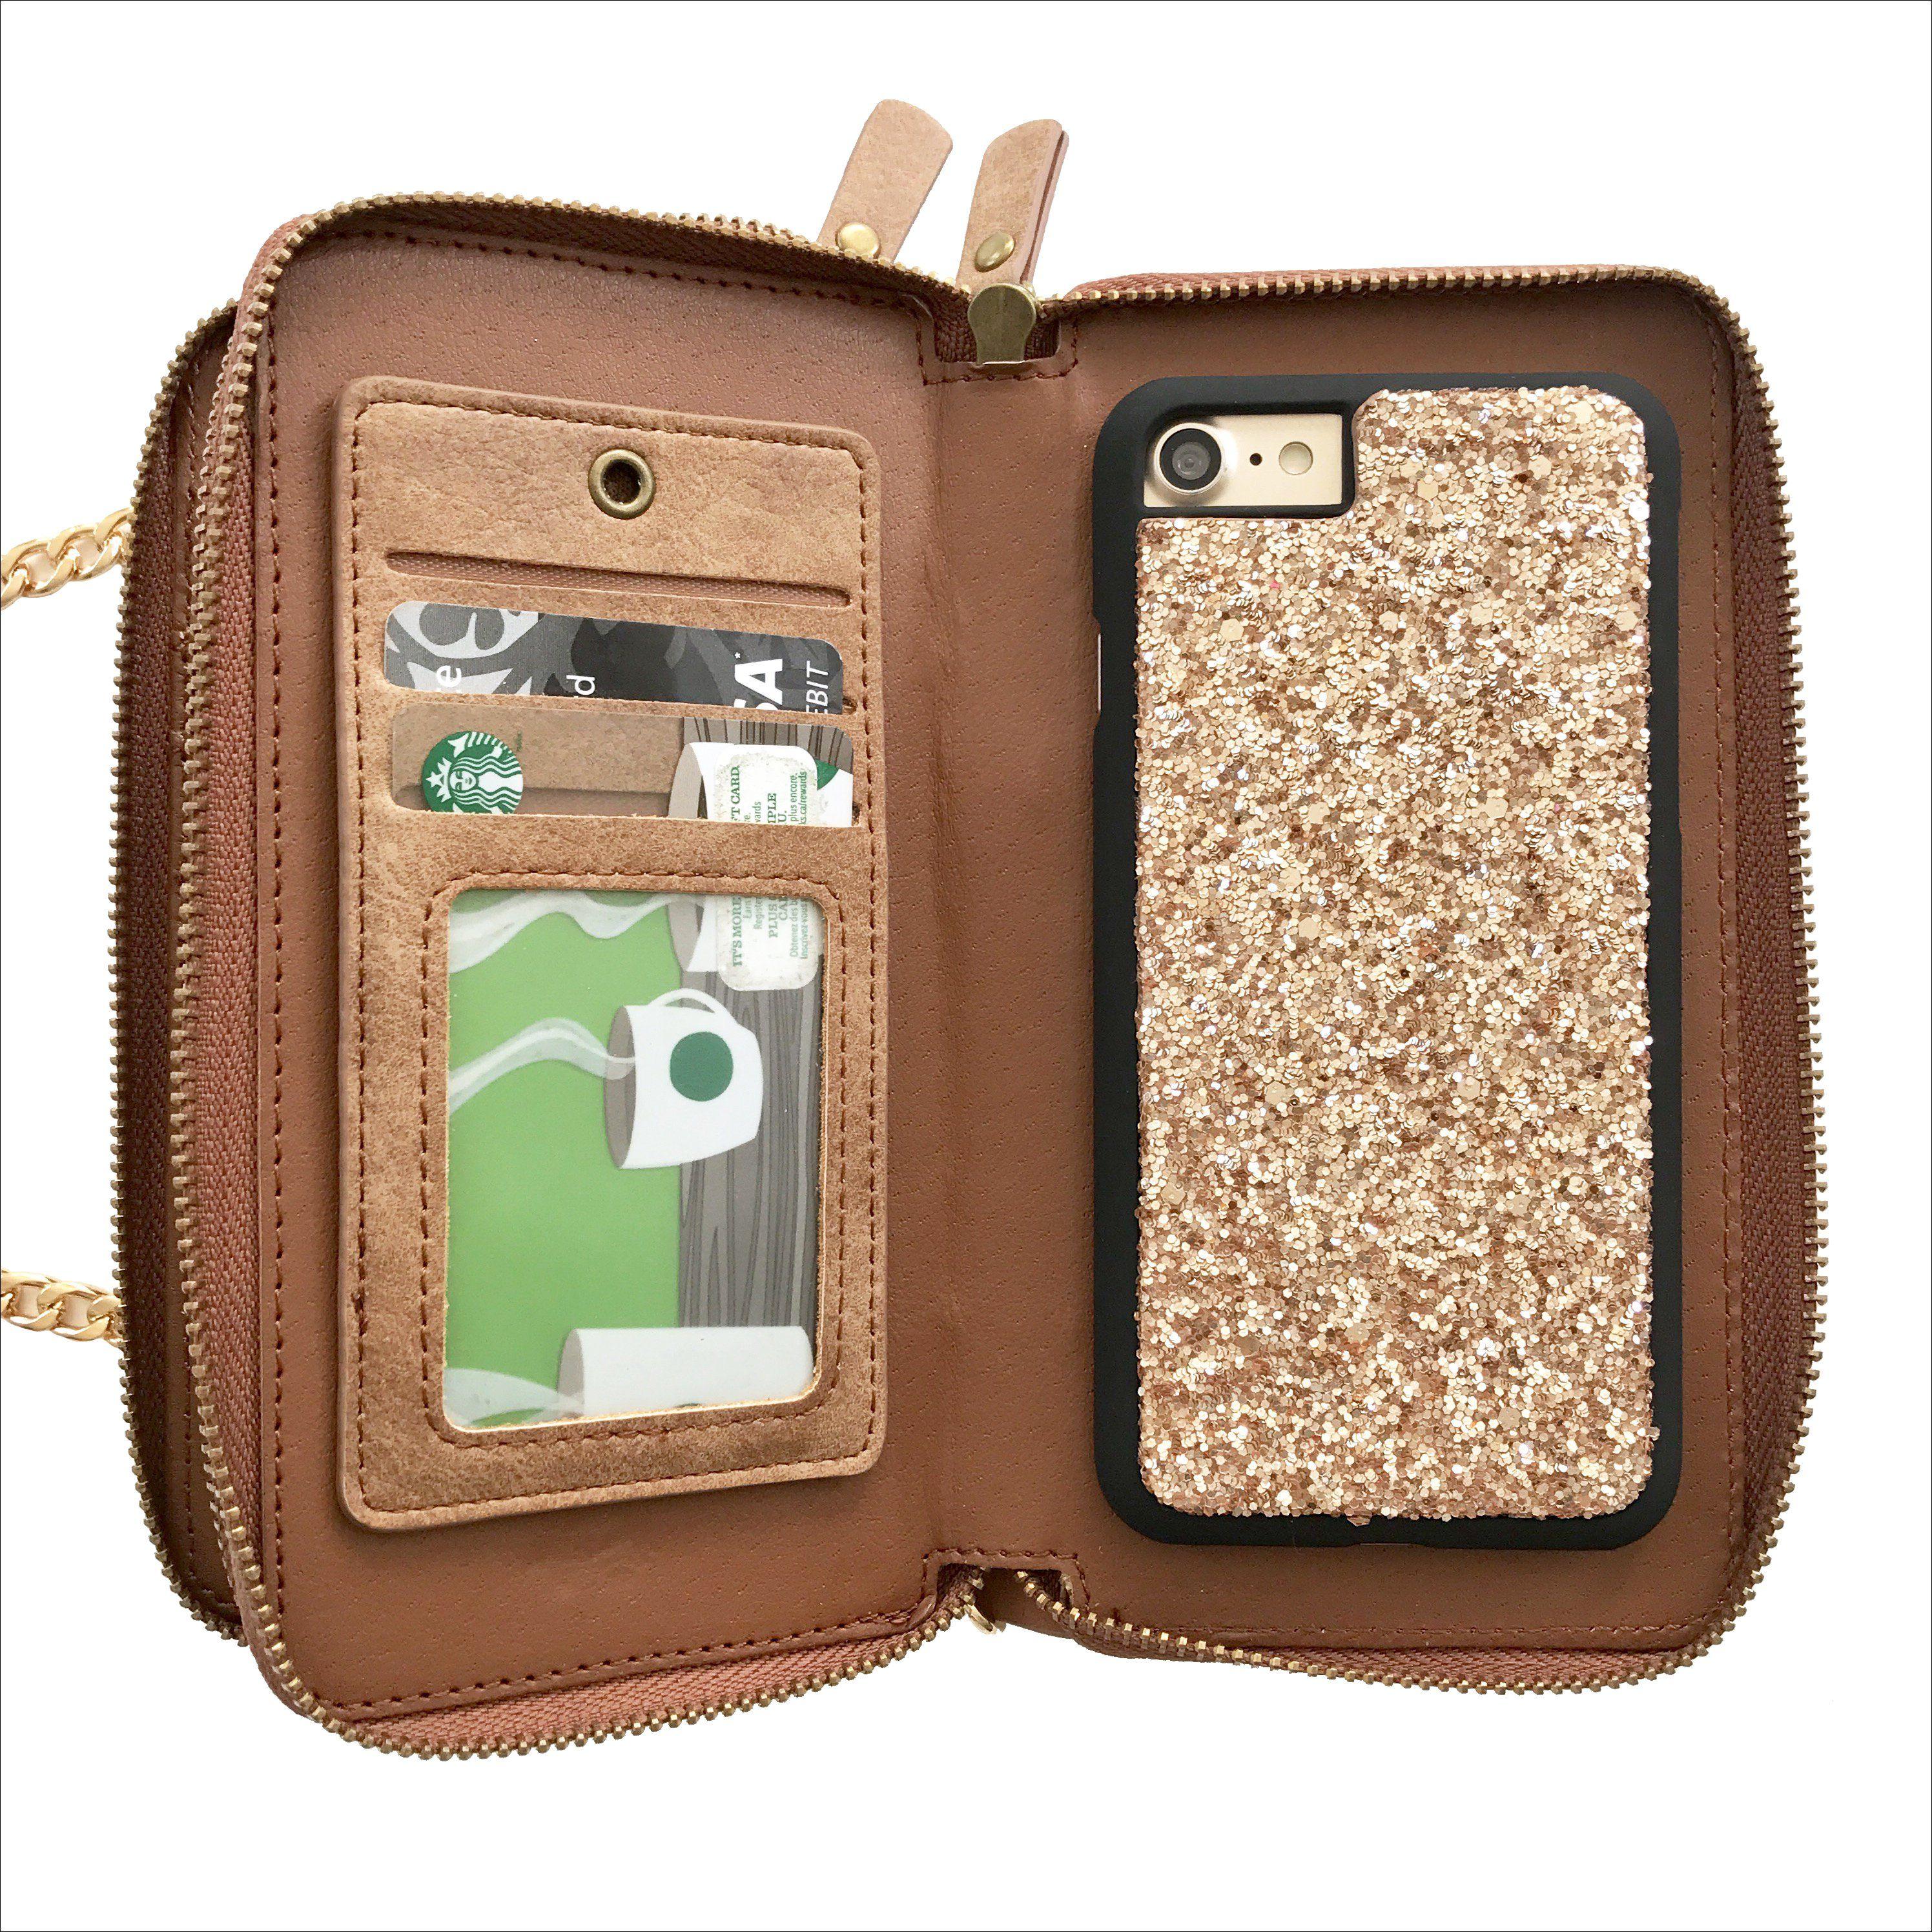 a52dcce68667 Champagne Glitter Crossbody Wallet Case in Tan Glitter Phone Cases